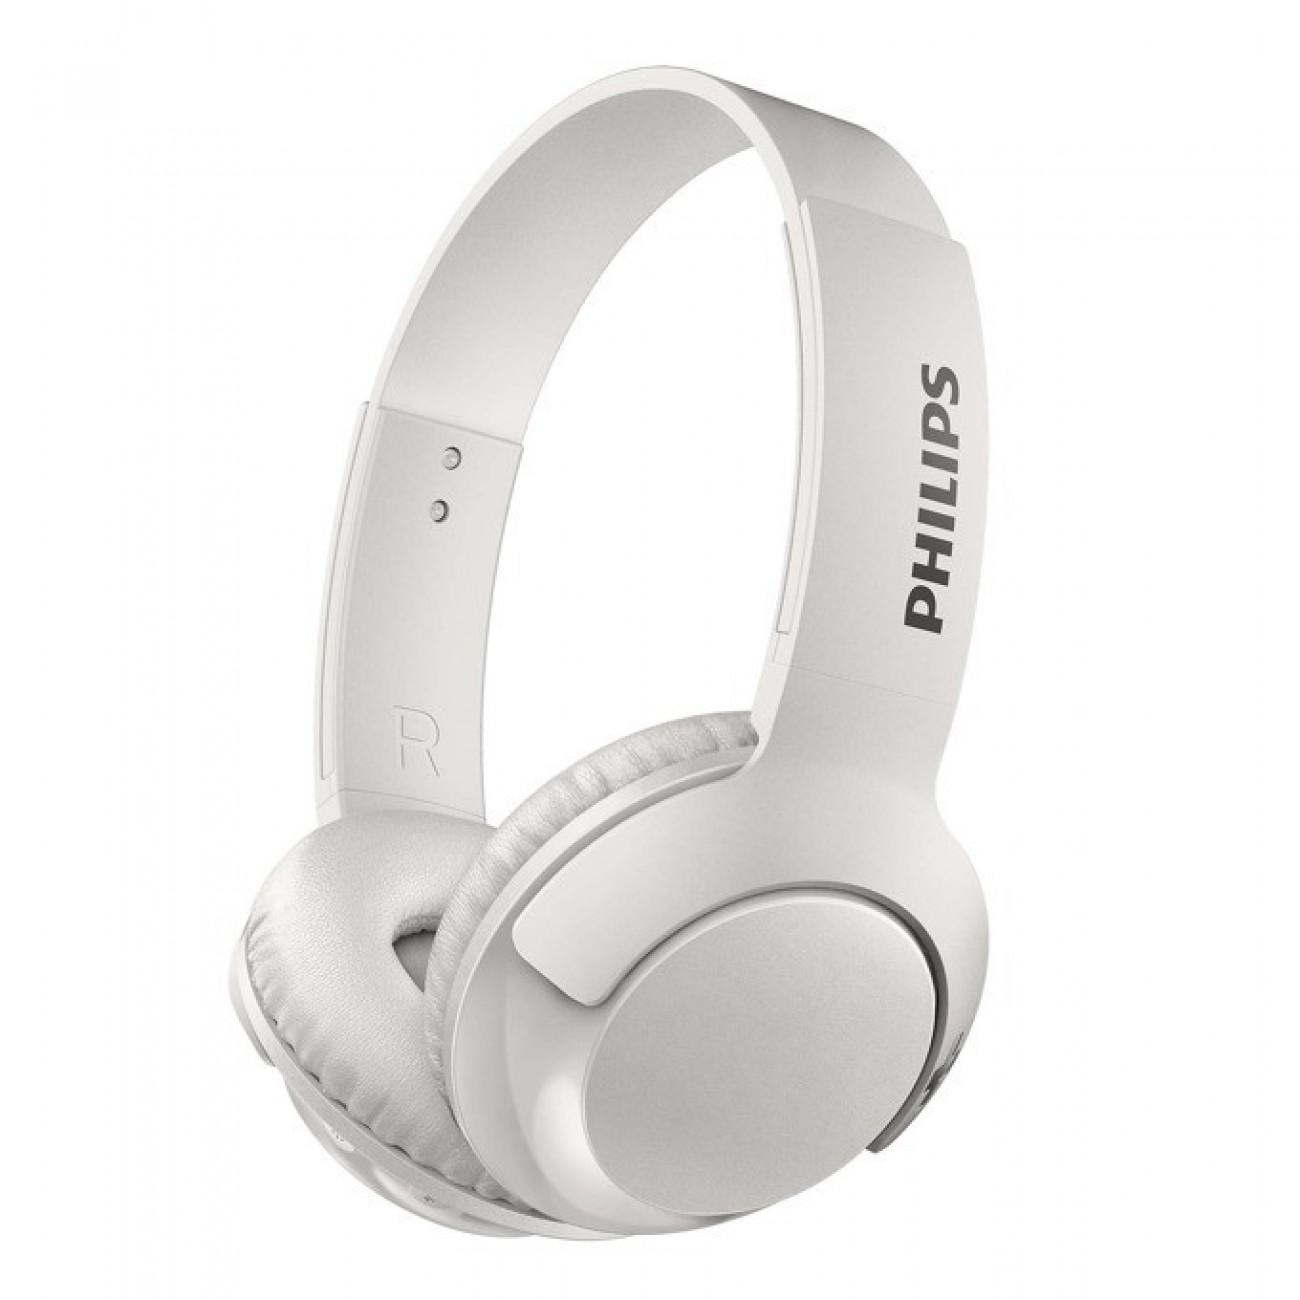 Слушалки Philips SHB3075WT, микрофон, Bluetooth, честотен диапазон 9  21 000 Hz, бели в Слушалки -    Alleop